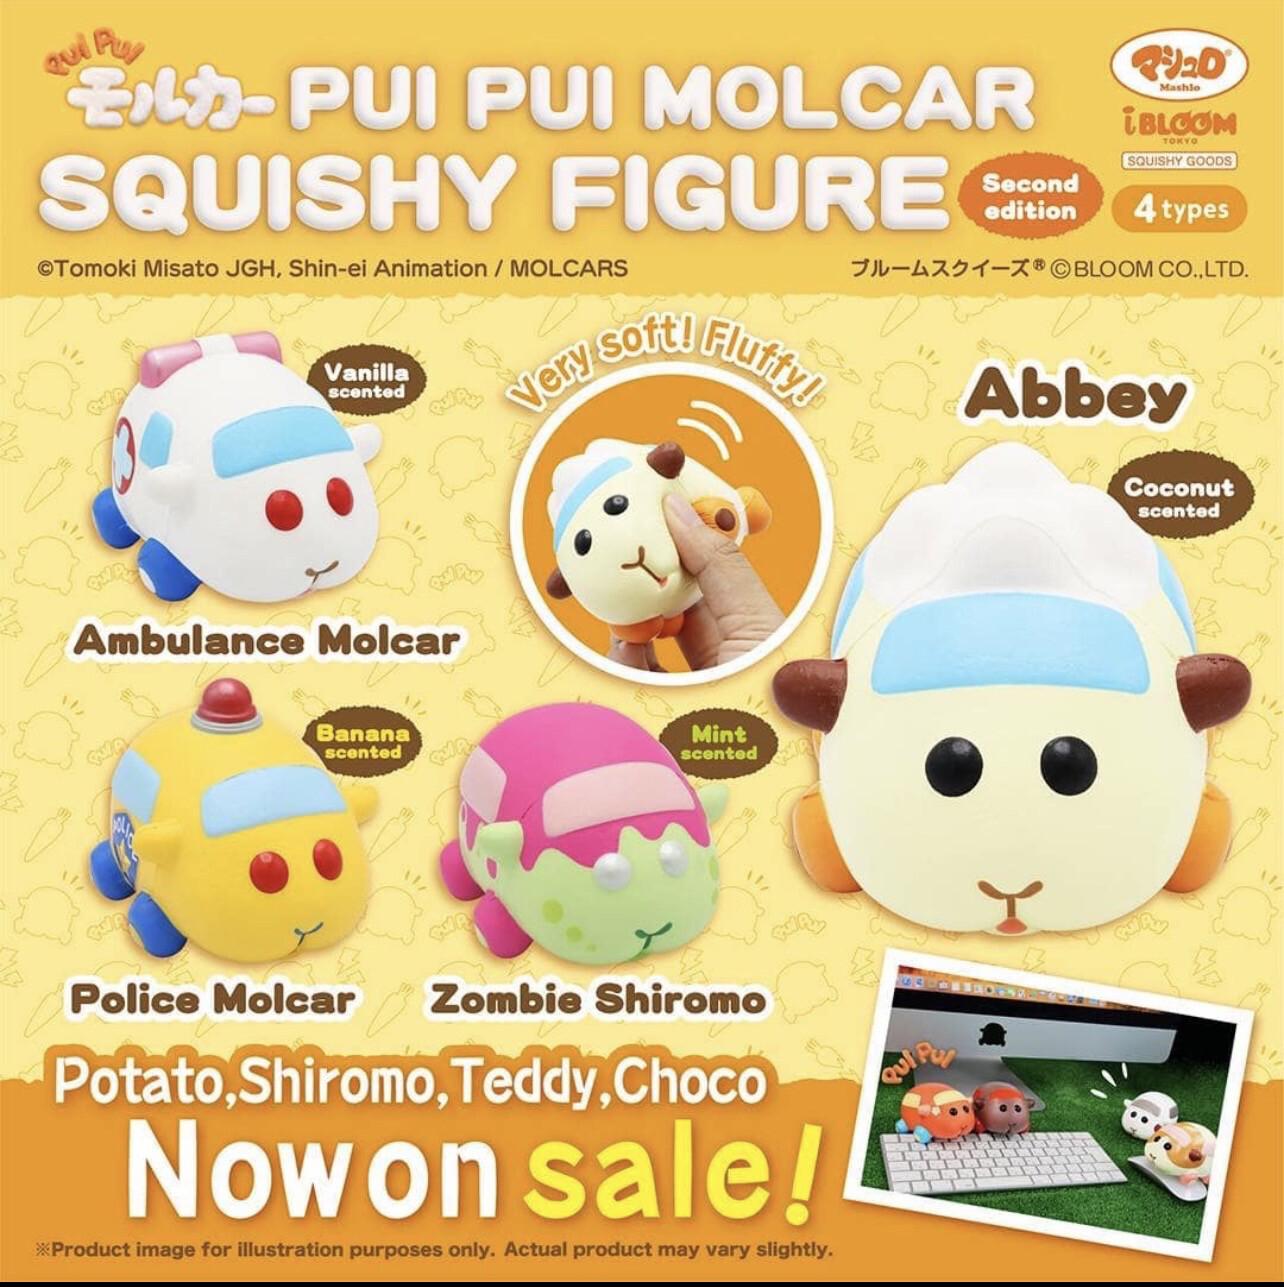 IBloom Pui Pui Molcar Squishy Part 2